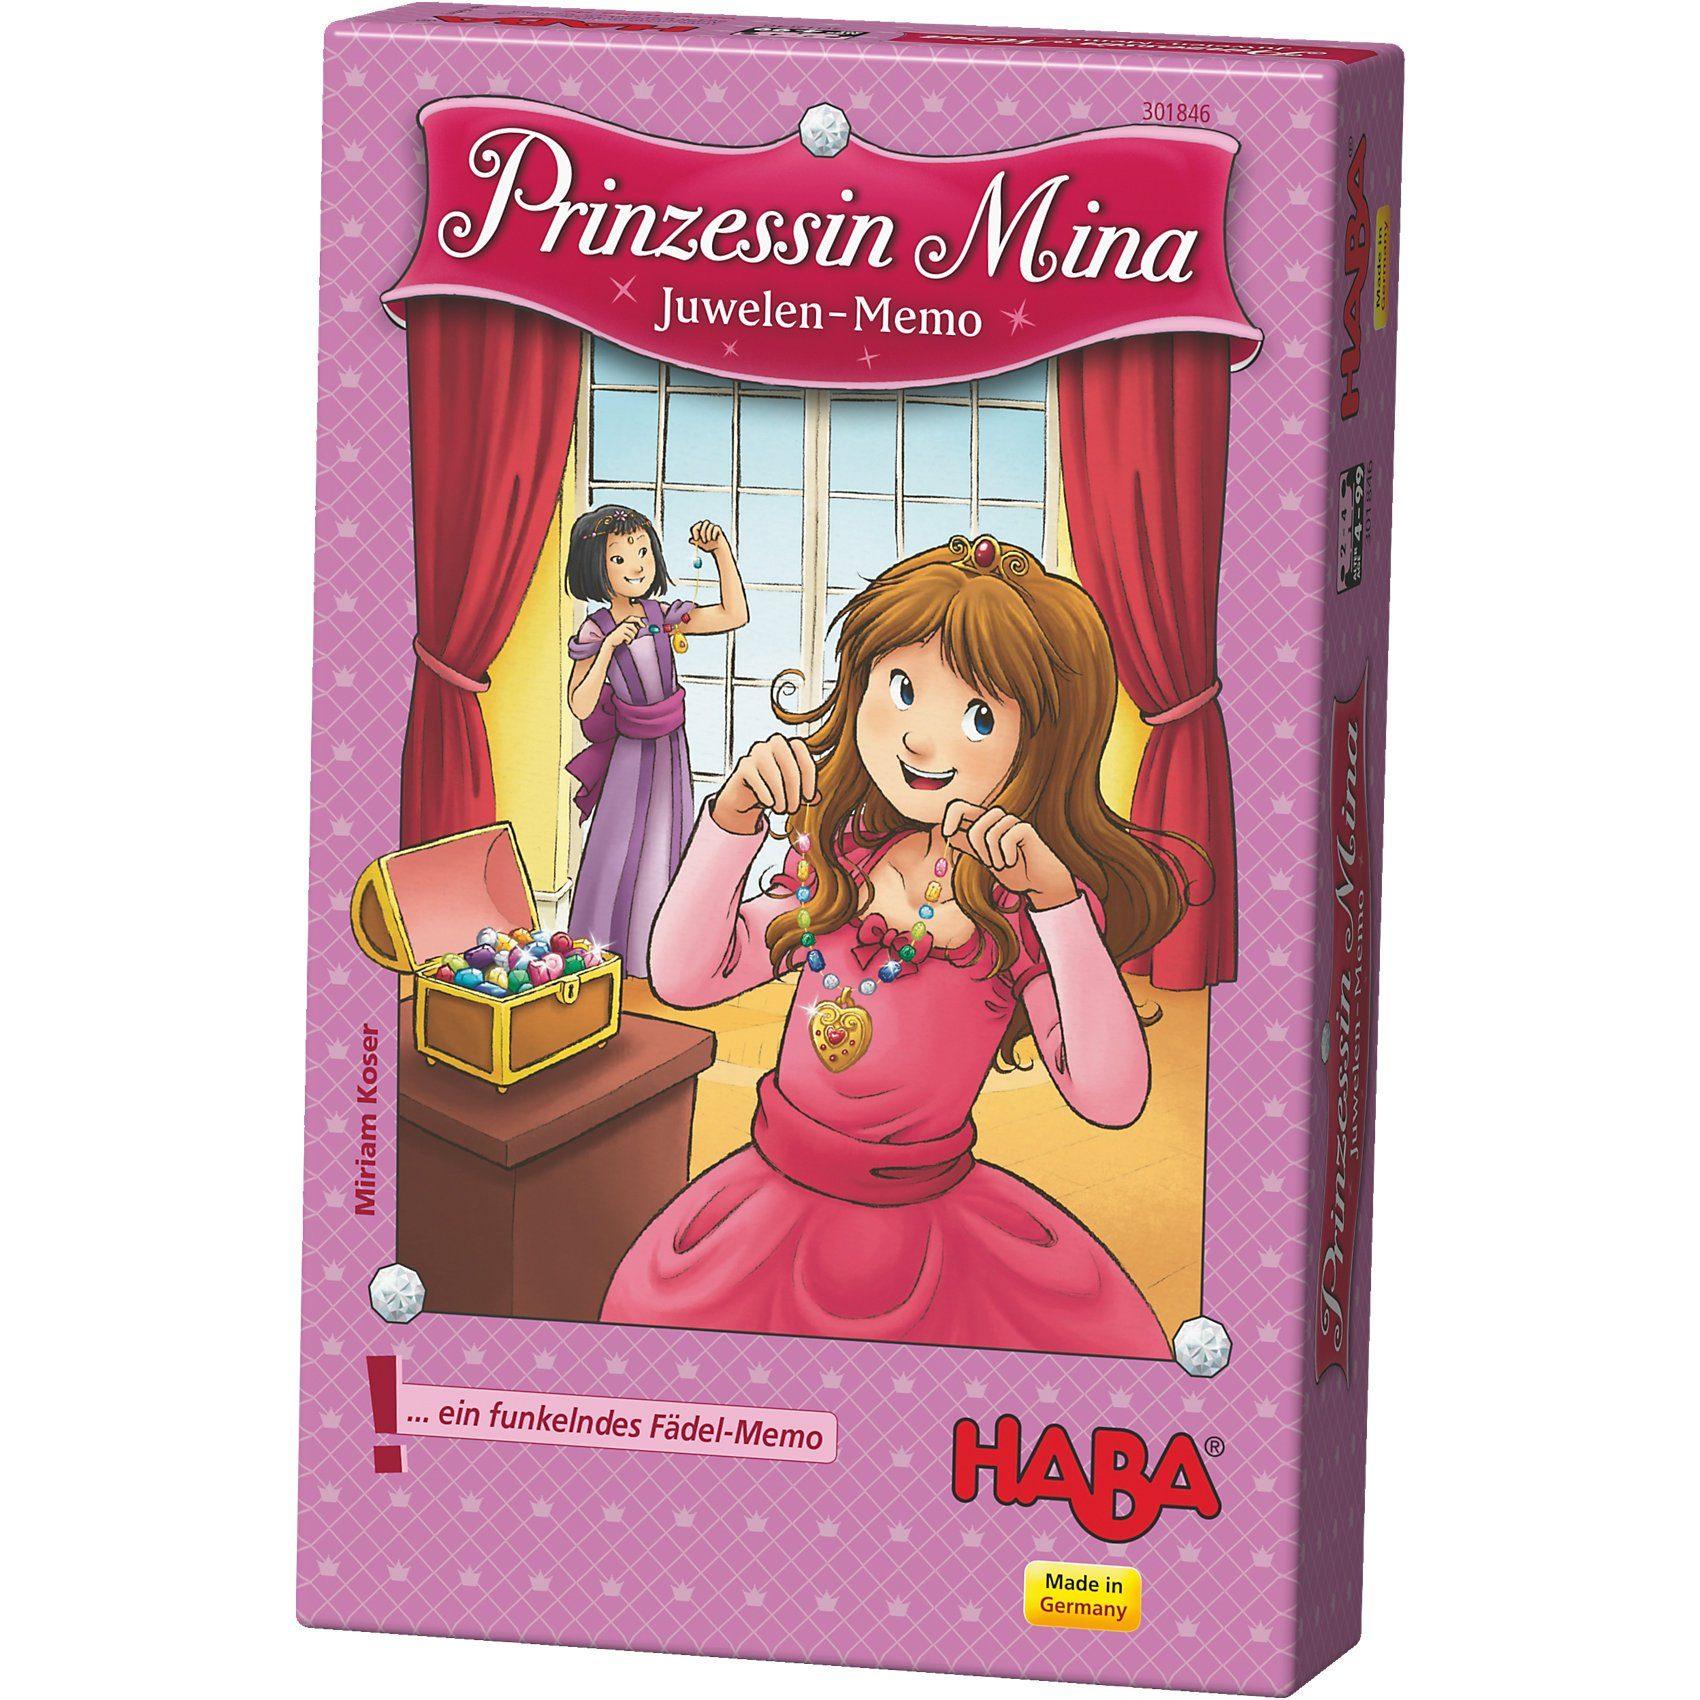 Haba Prinzessin Mina - Juwelen-Memo